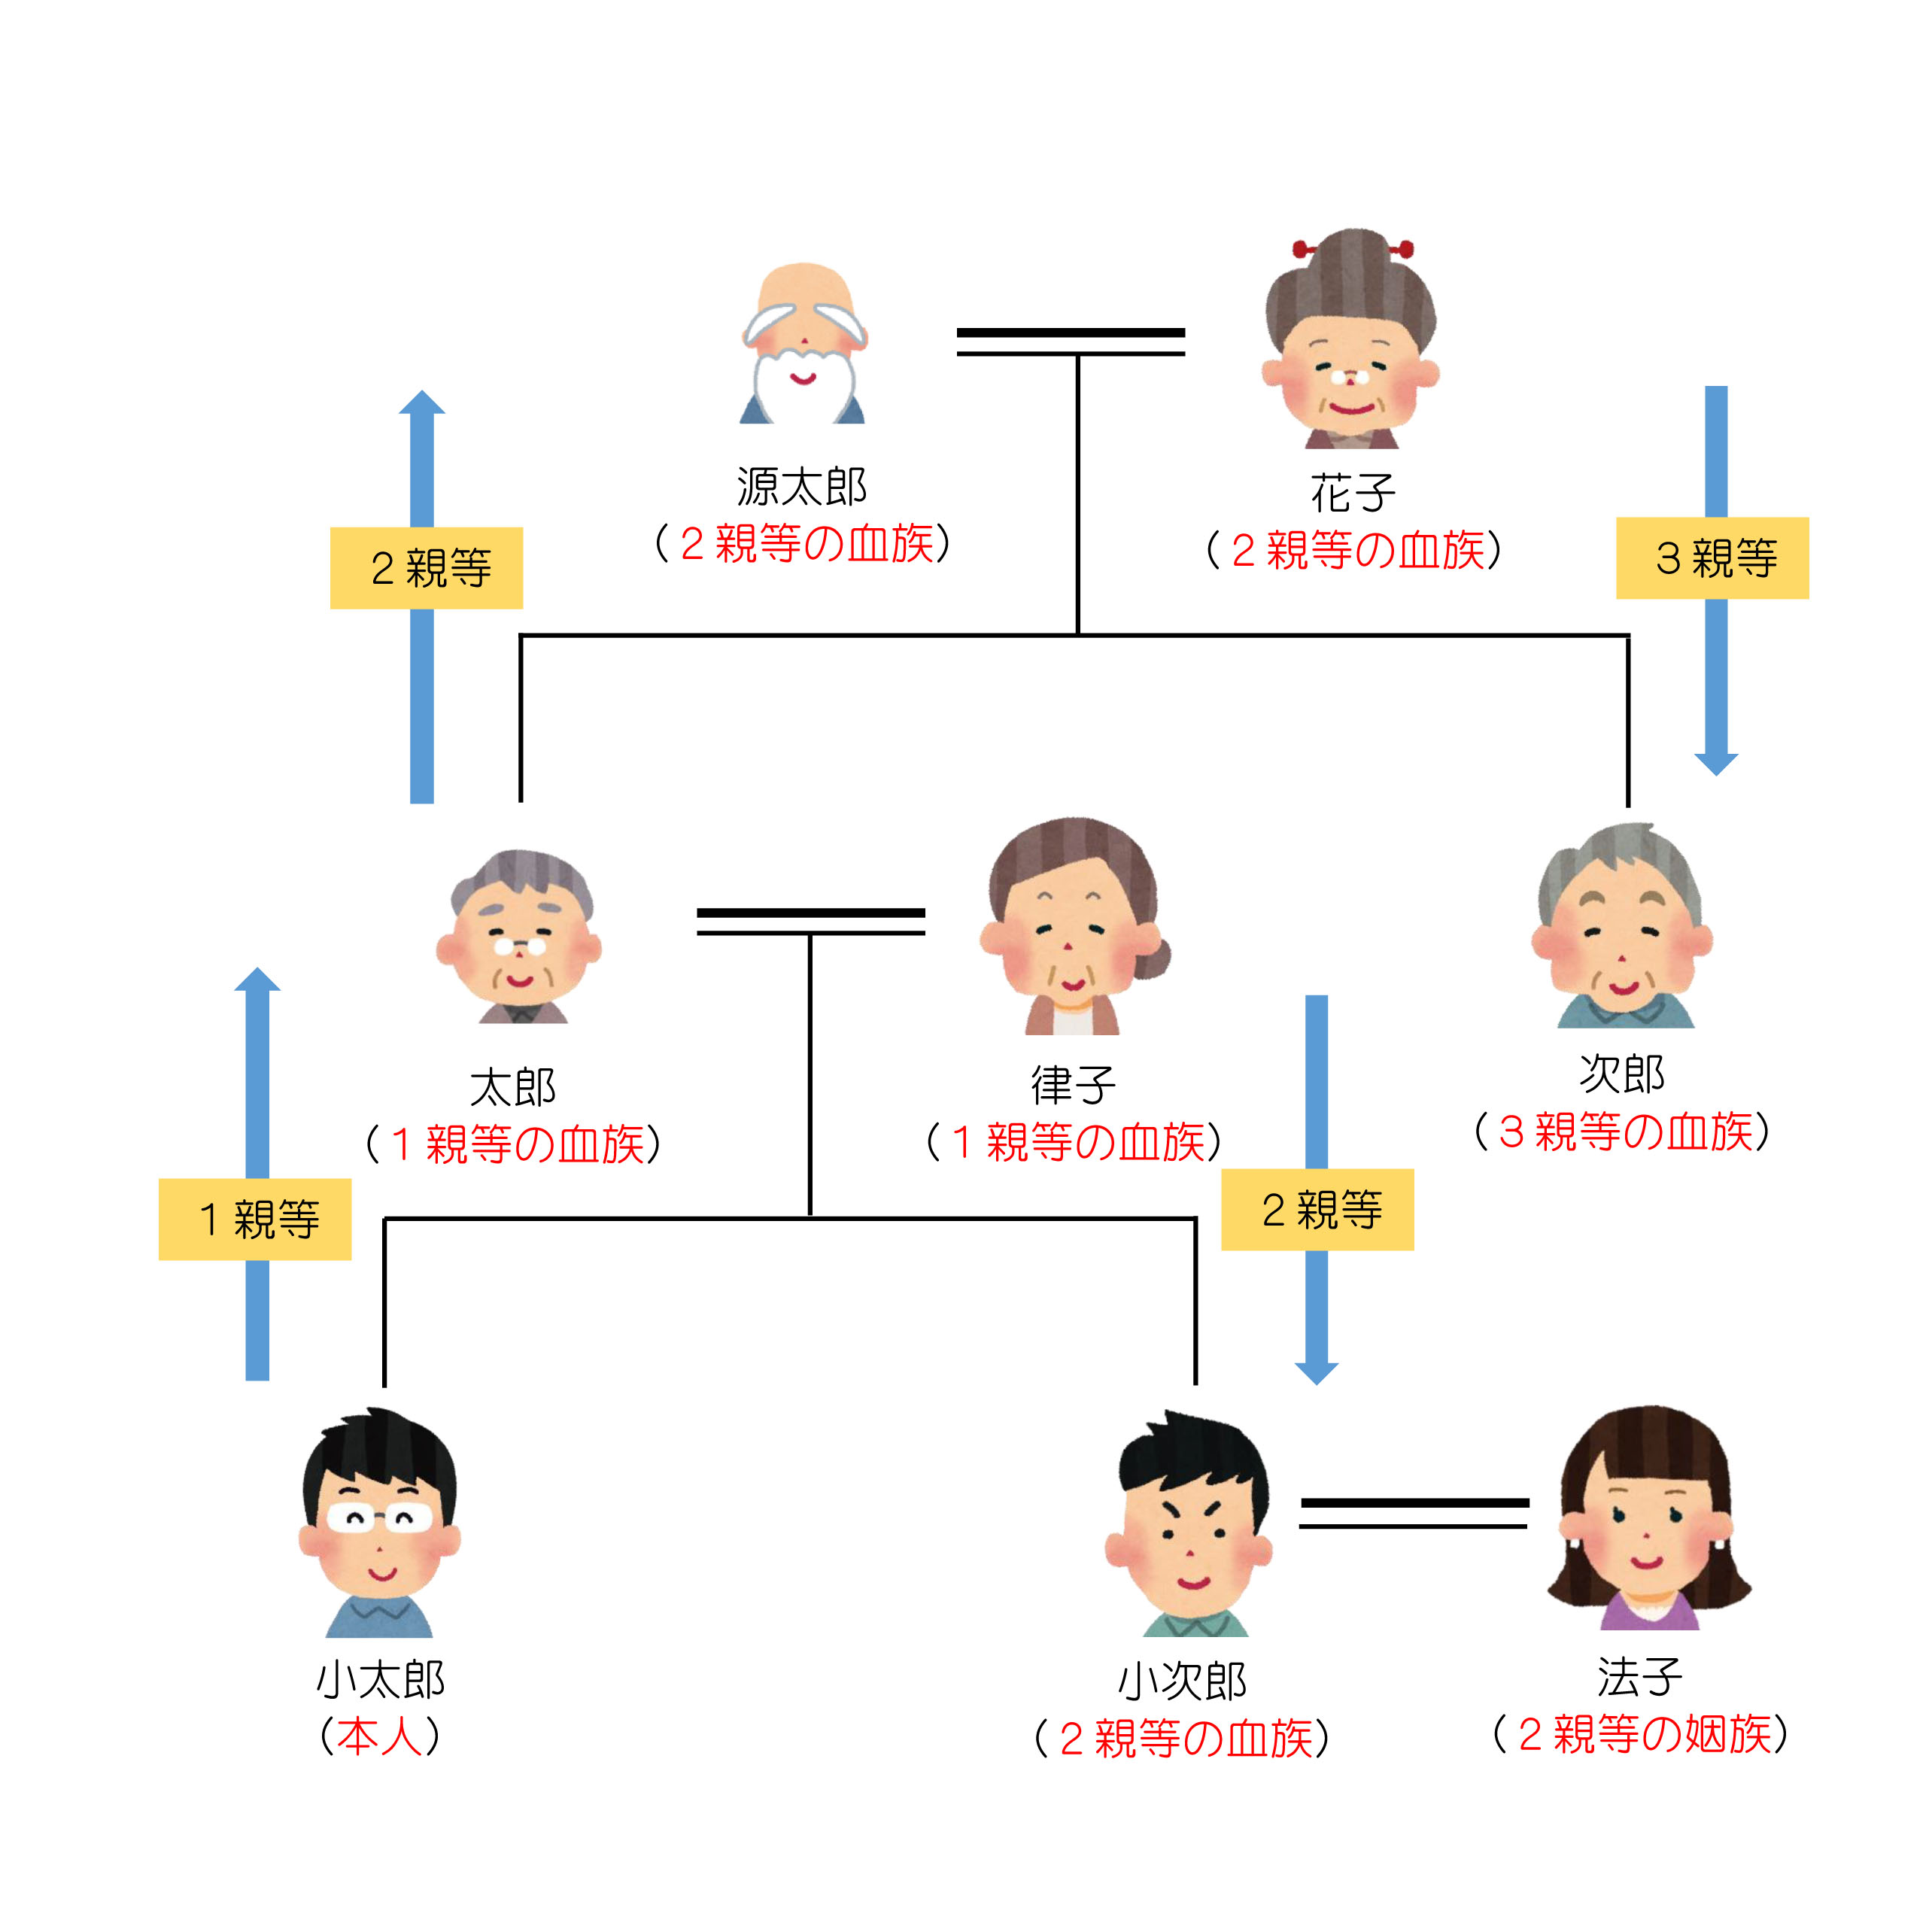 札幌北司法書士 | マニアック法律知識~親族の範囲?~札幌北司法書士